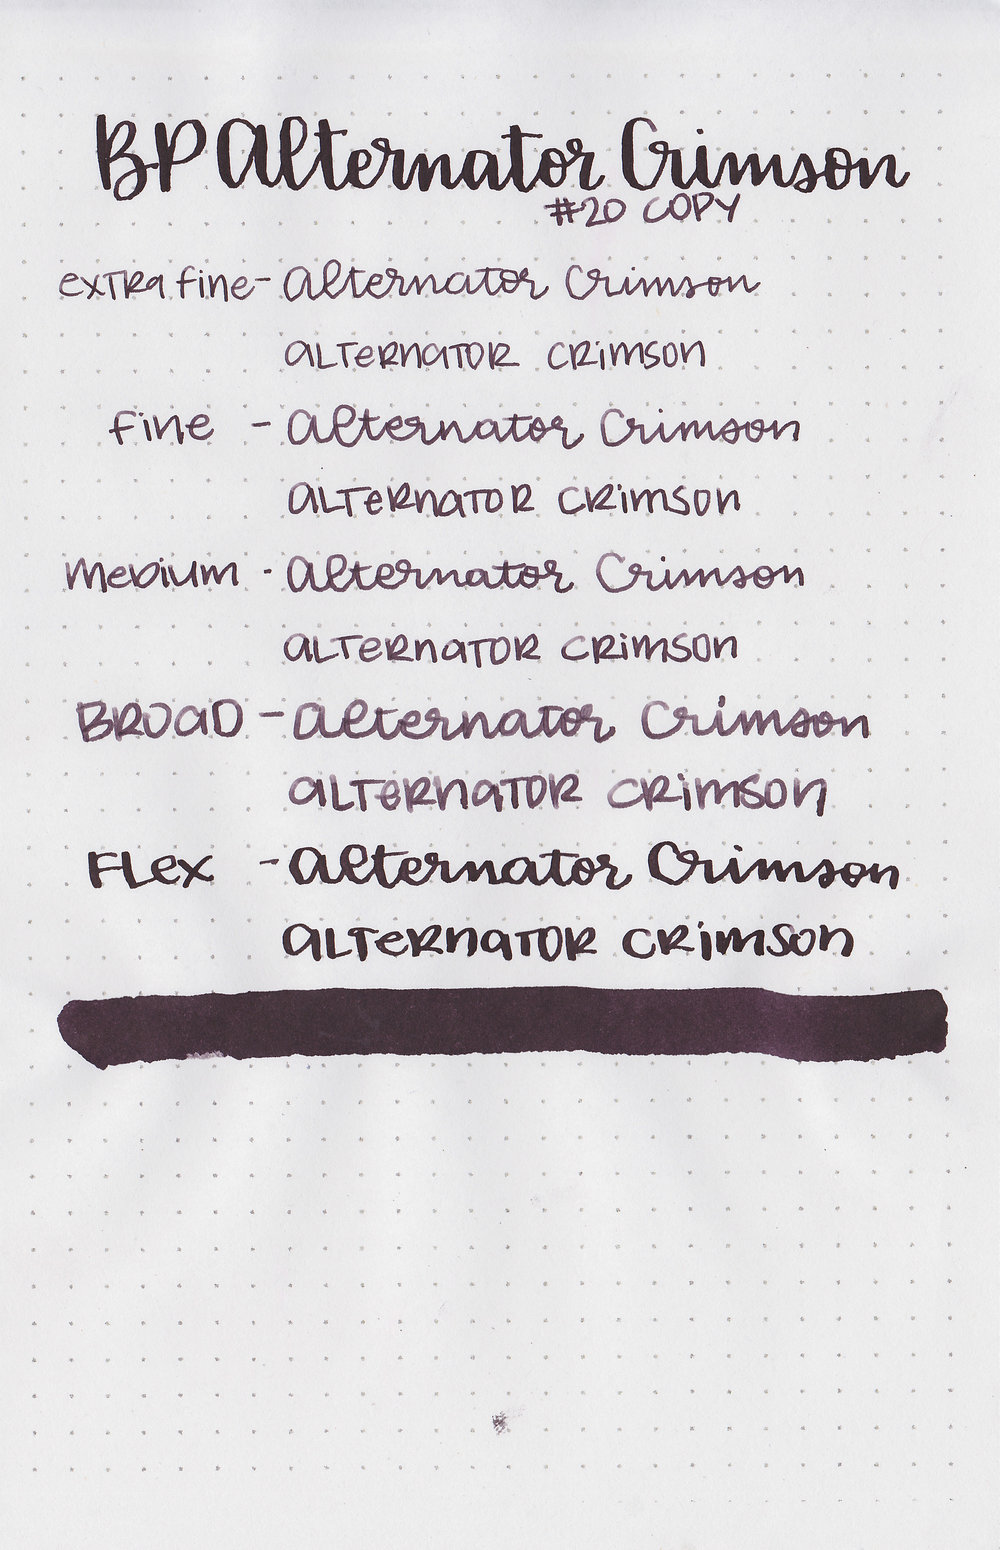 bp-alternator-crimson-13.jpg